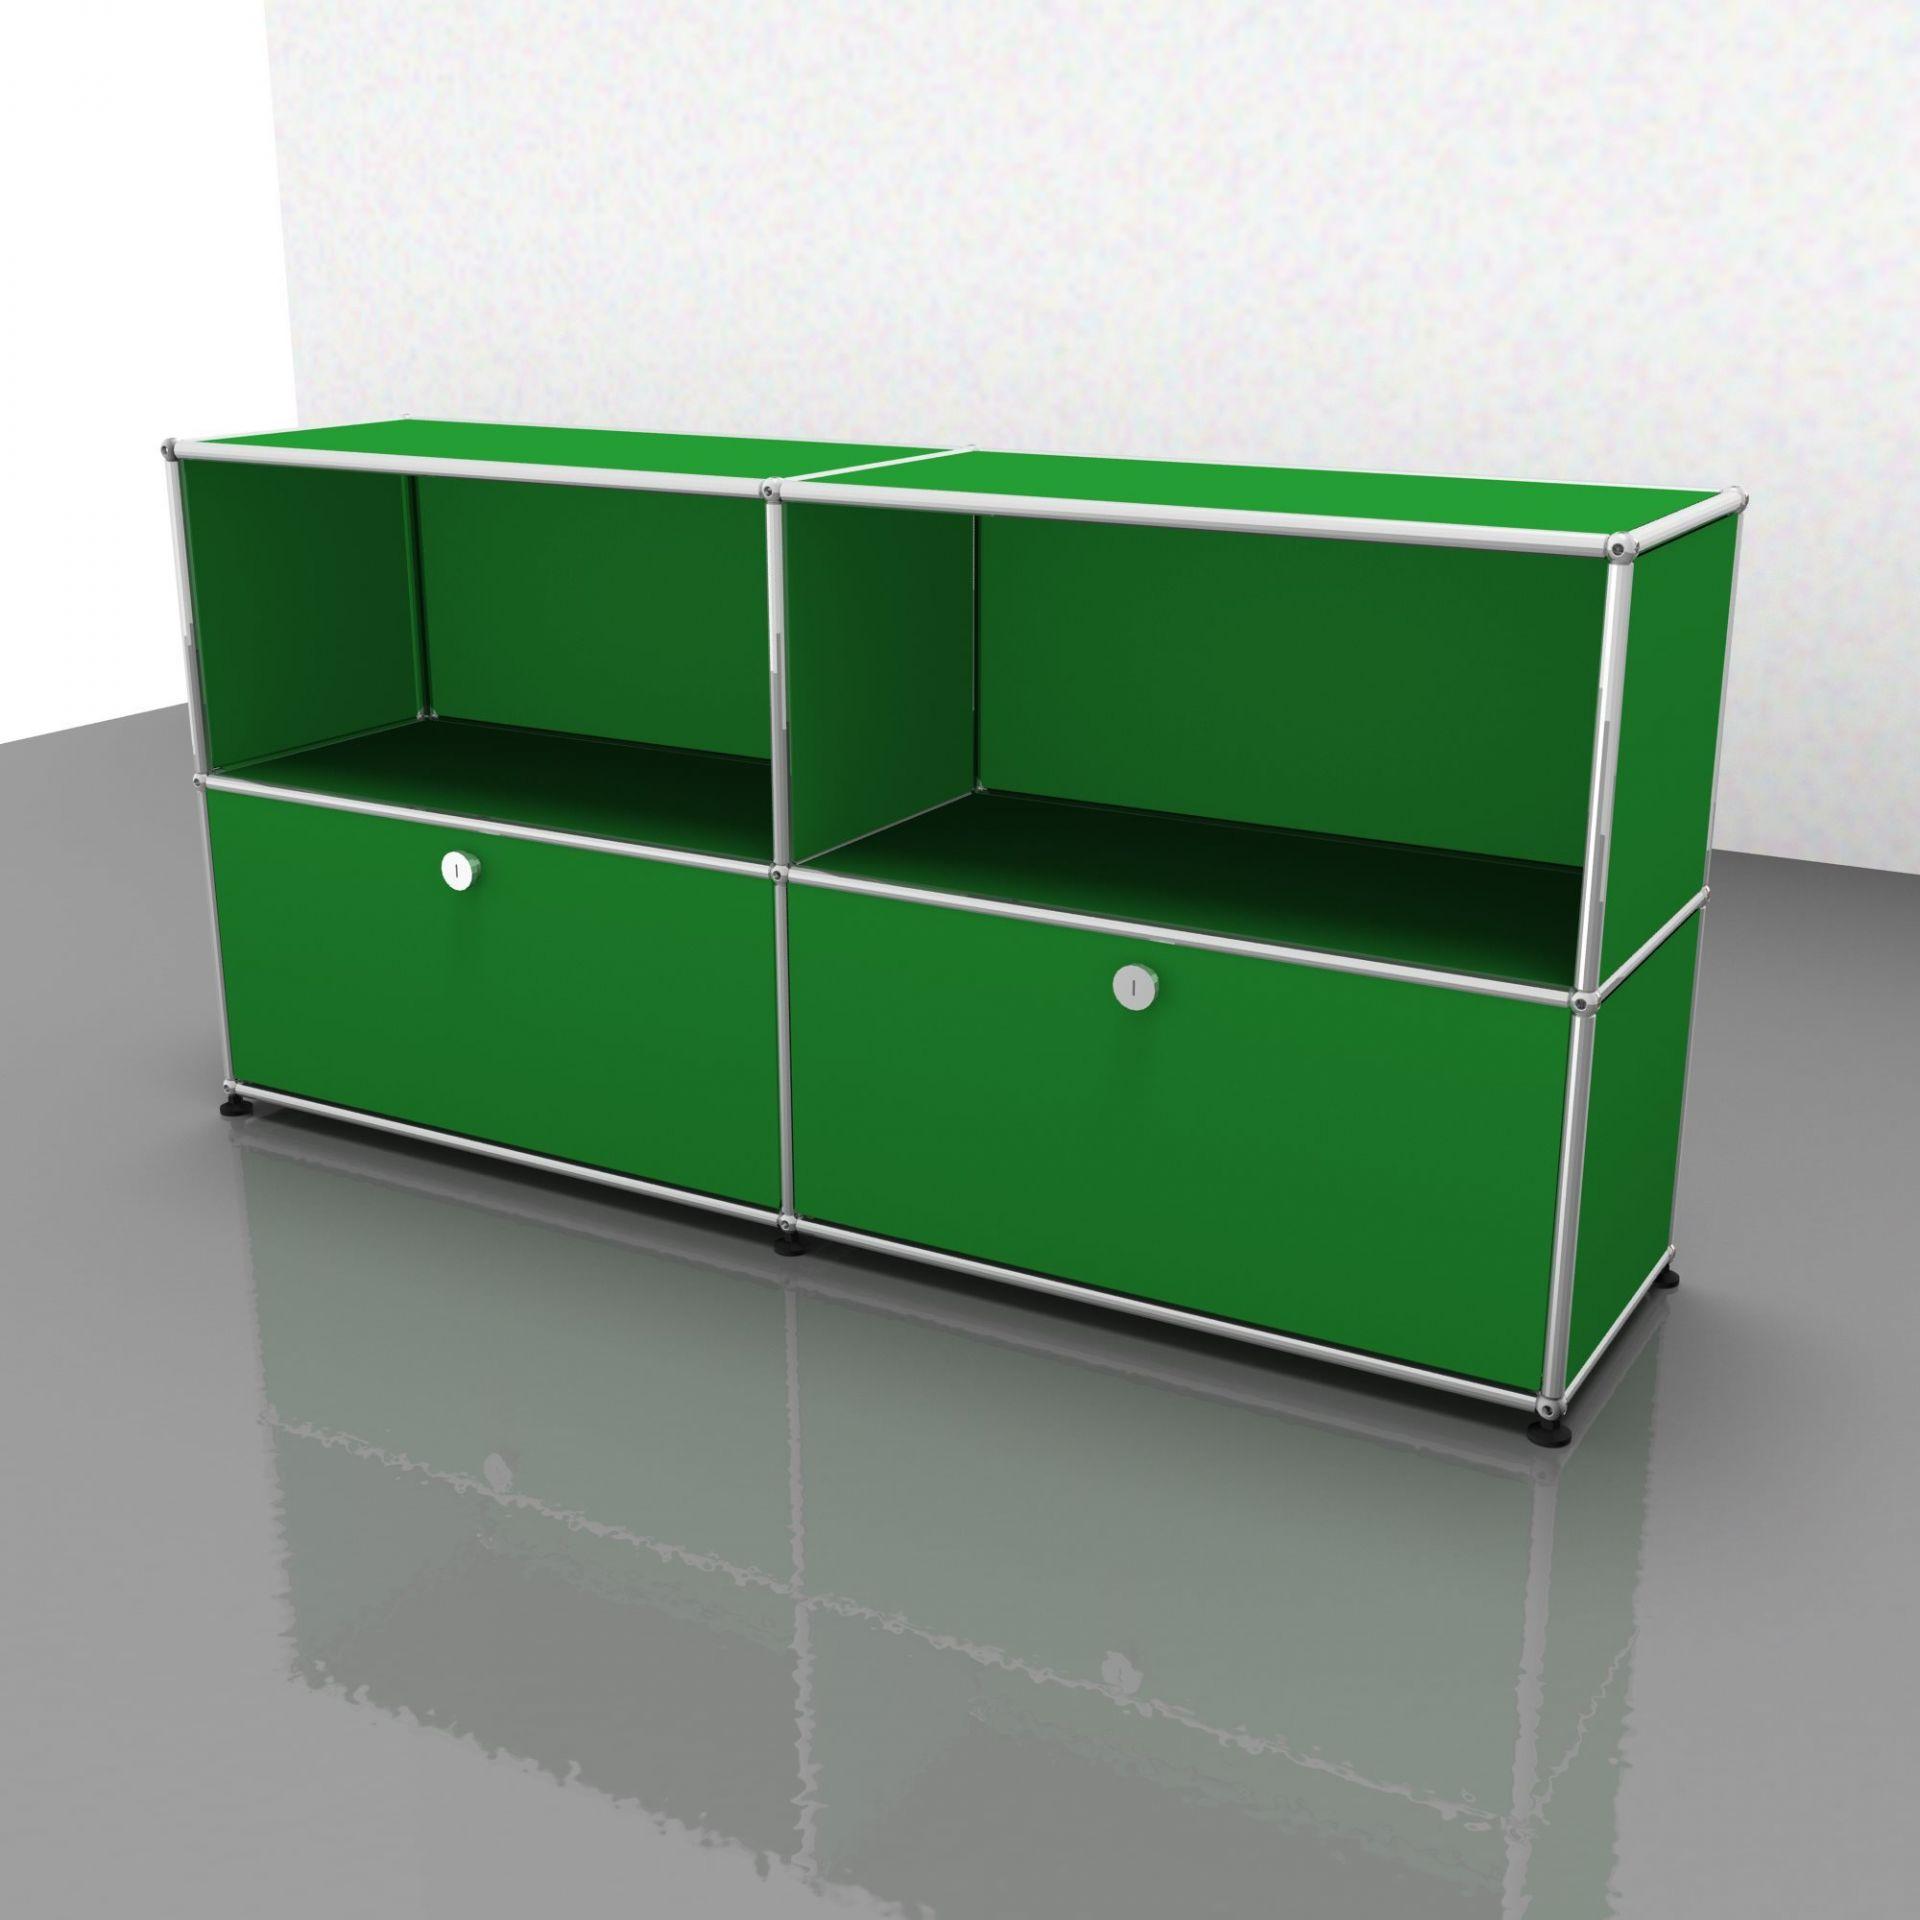 USM Haller Sideboard Schubladen -grün